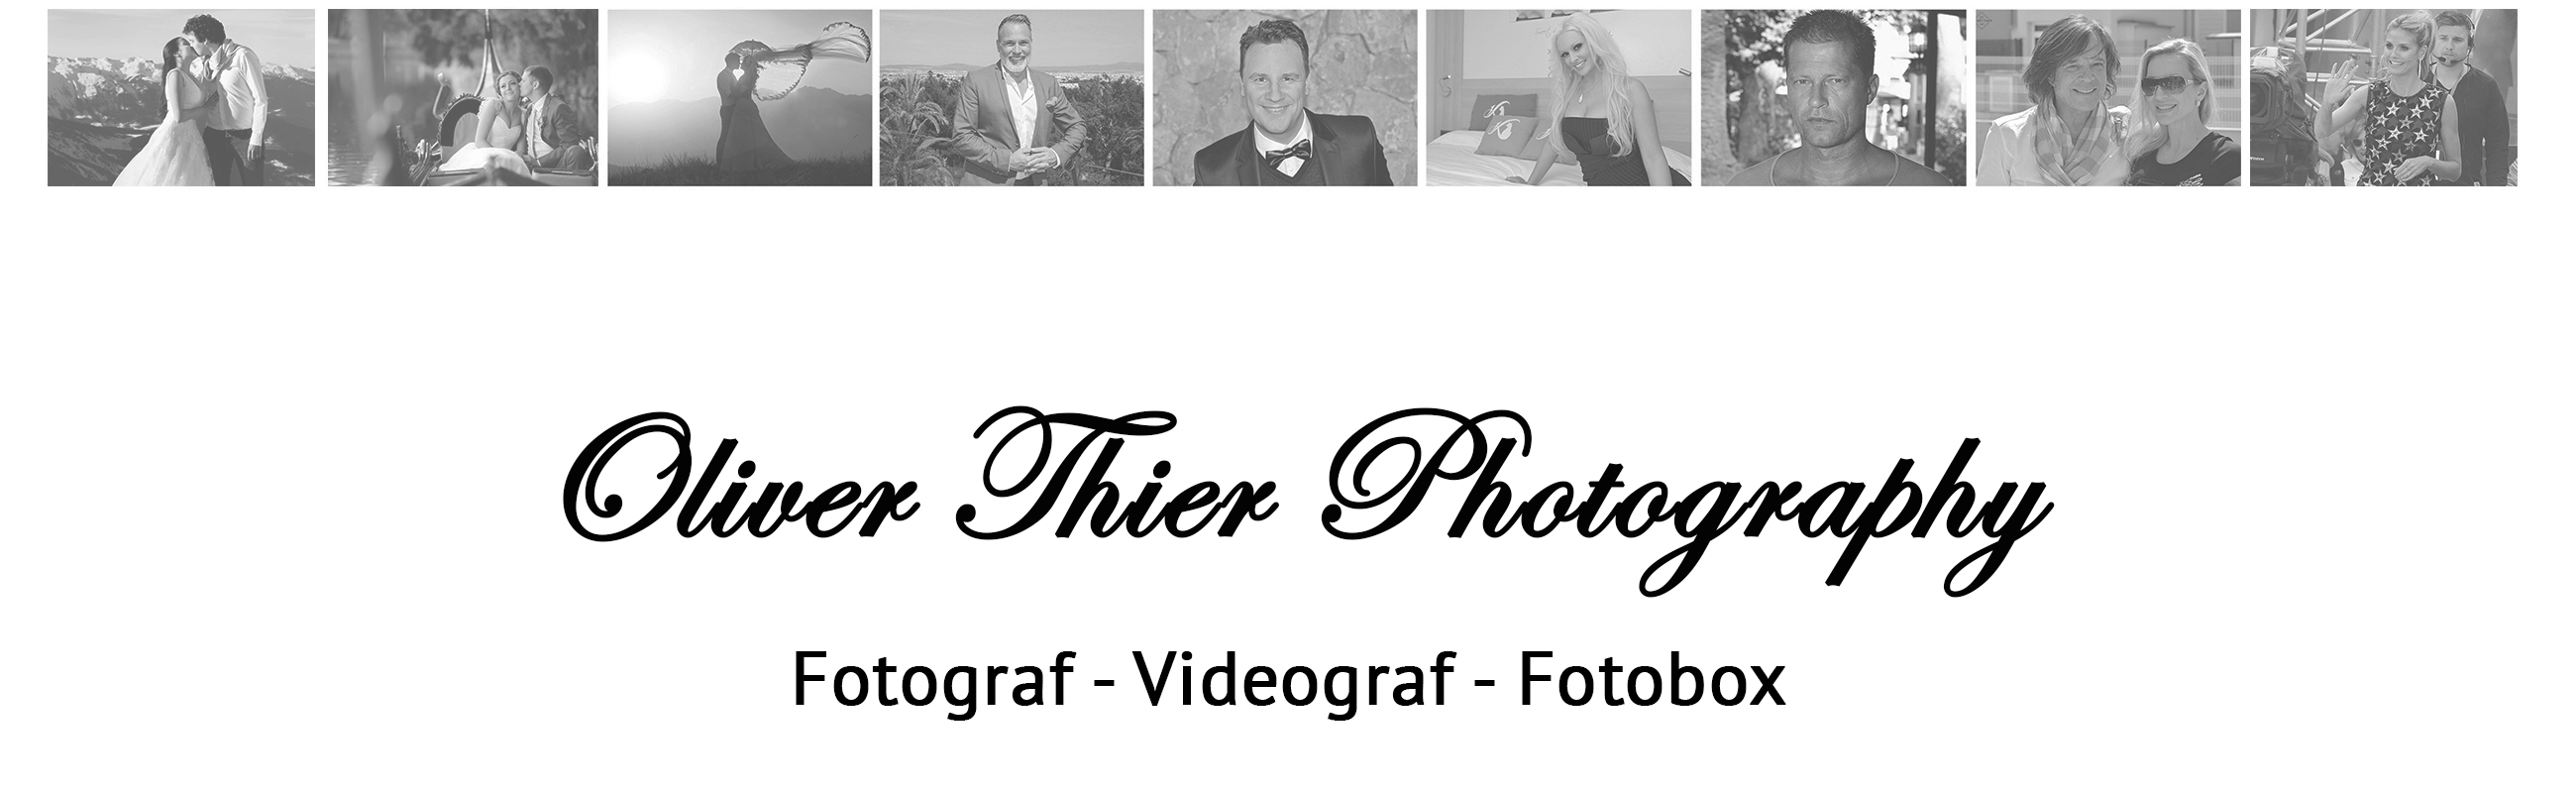 FOTOGRAF - HOCHZEITSFOTOGRAF VENEDIG BOZEN MERAN BRIXEN SÜDTIROL SEXTEN GARDASEE